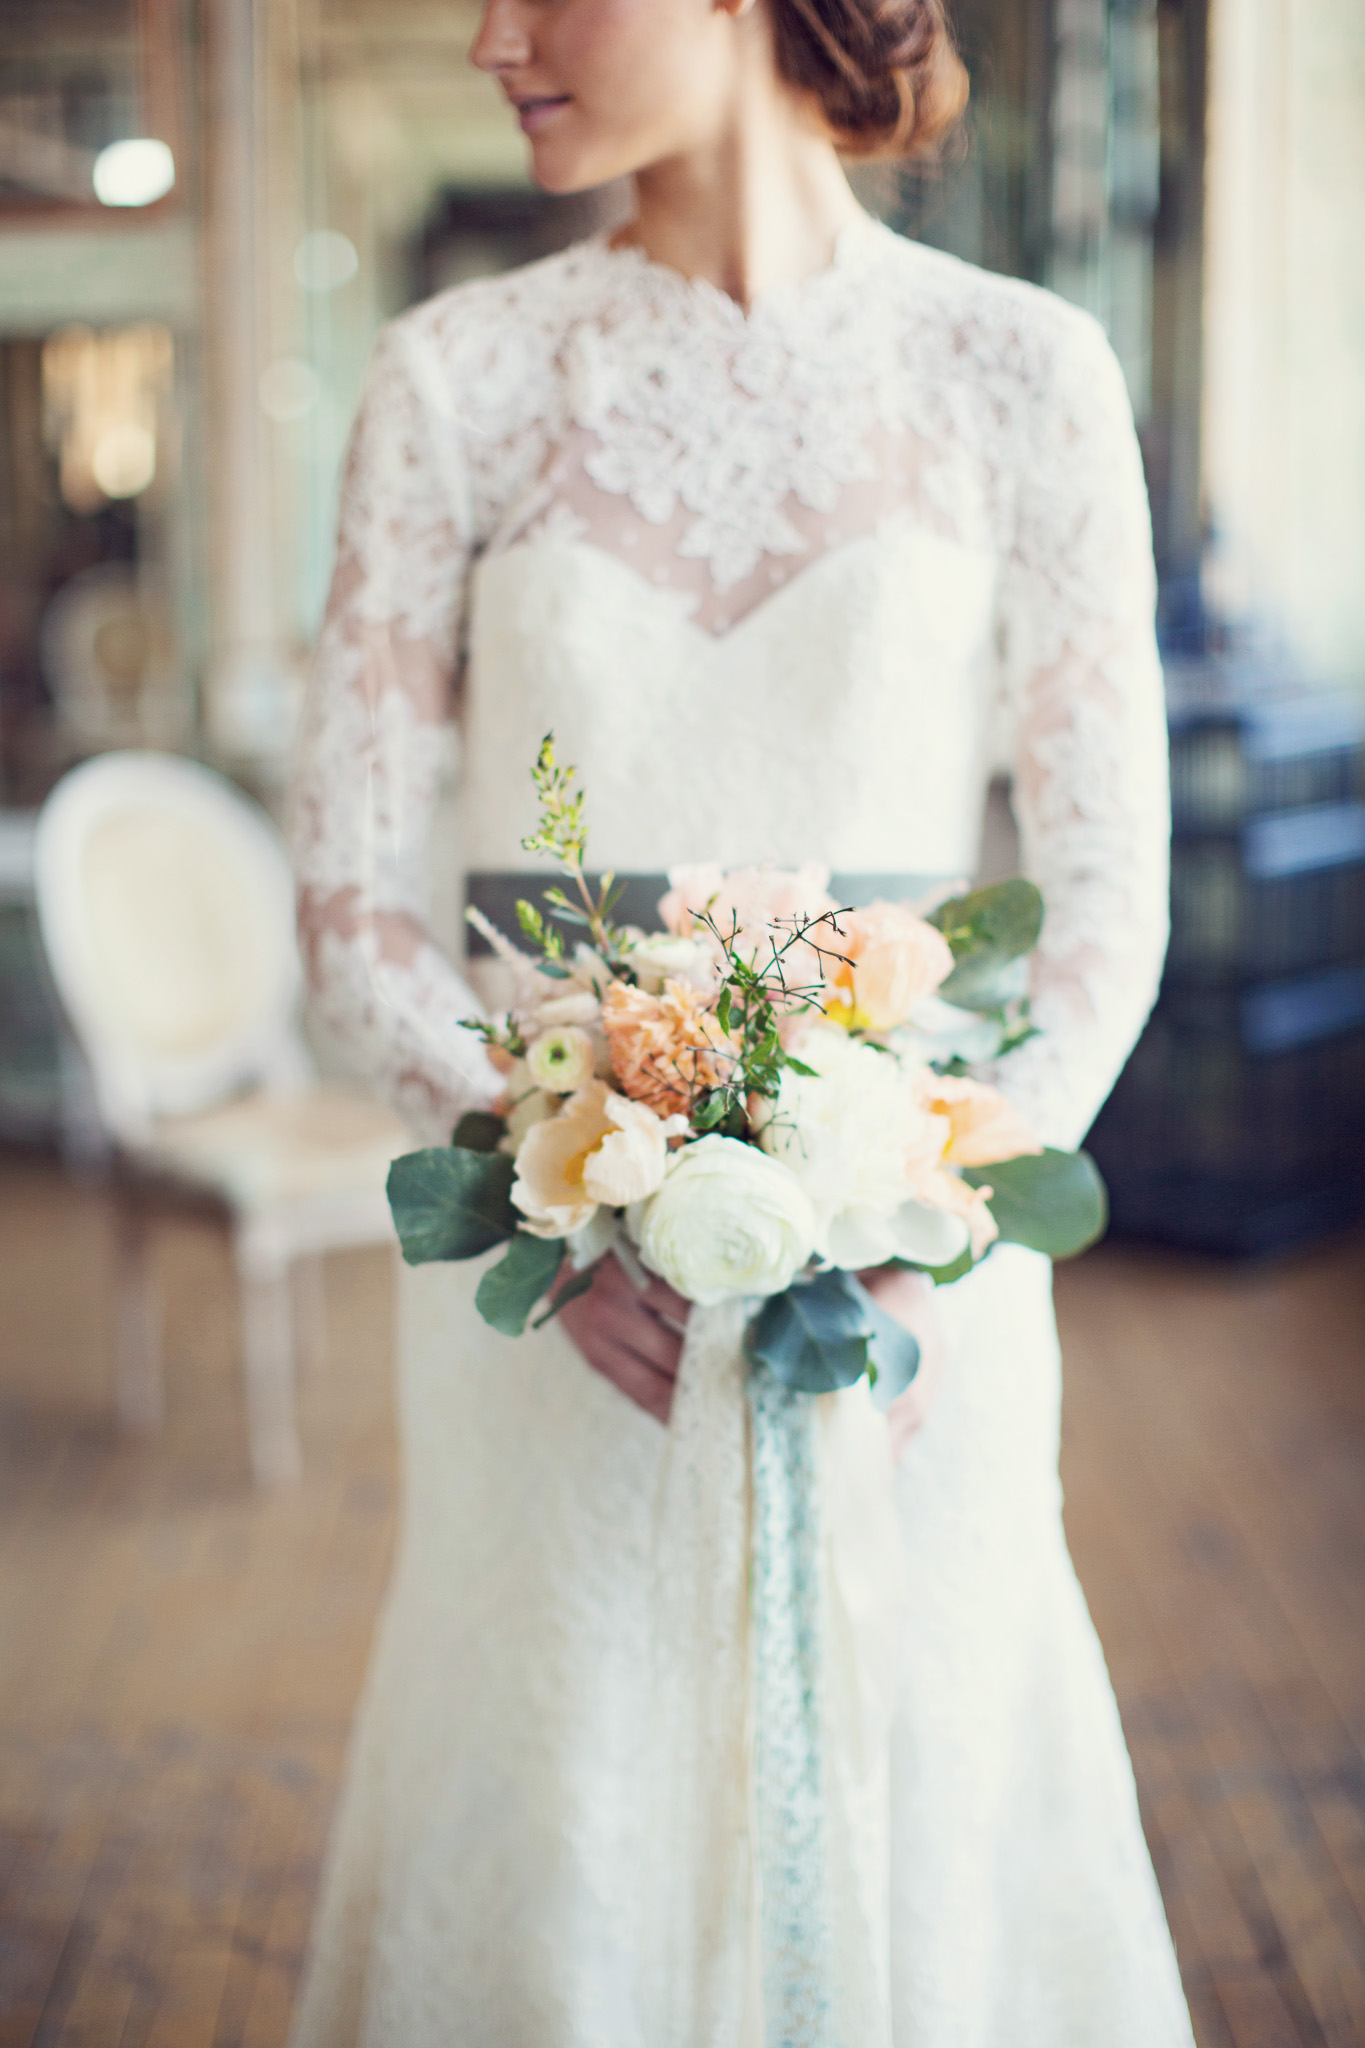 loose-organic-bouquet-eucalyptus-long-sleeve-lace-dress